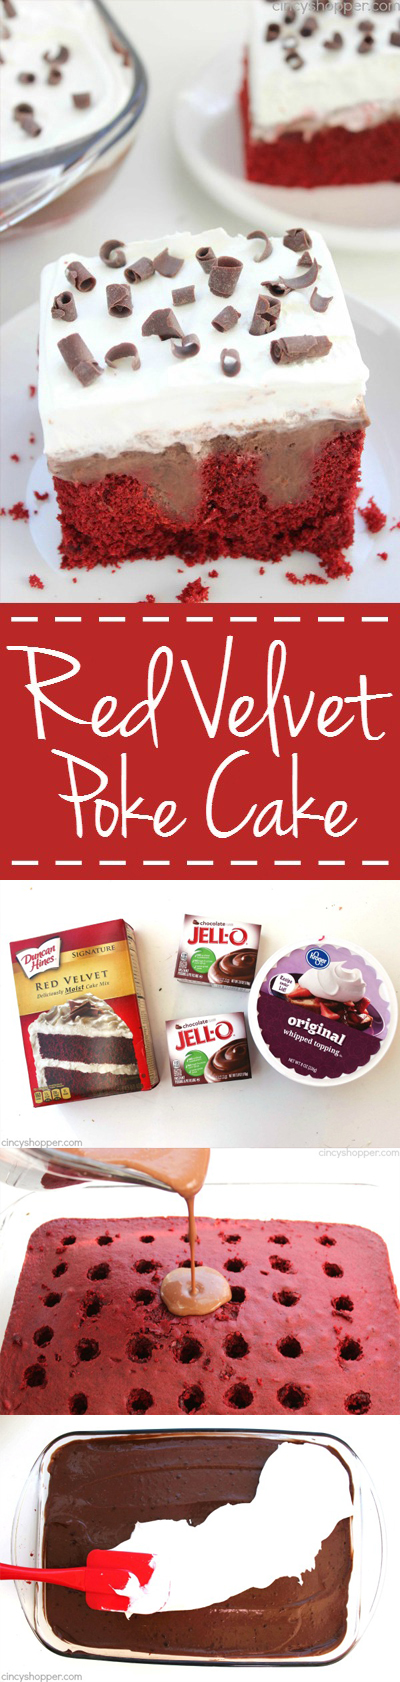 Red Velvet Poke Cake - Super simple dessert idea that tastes AMAZING! Perfect for the holidays.